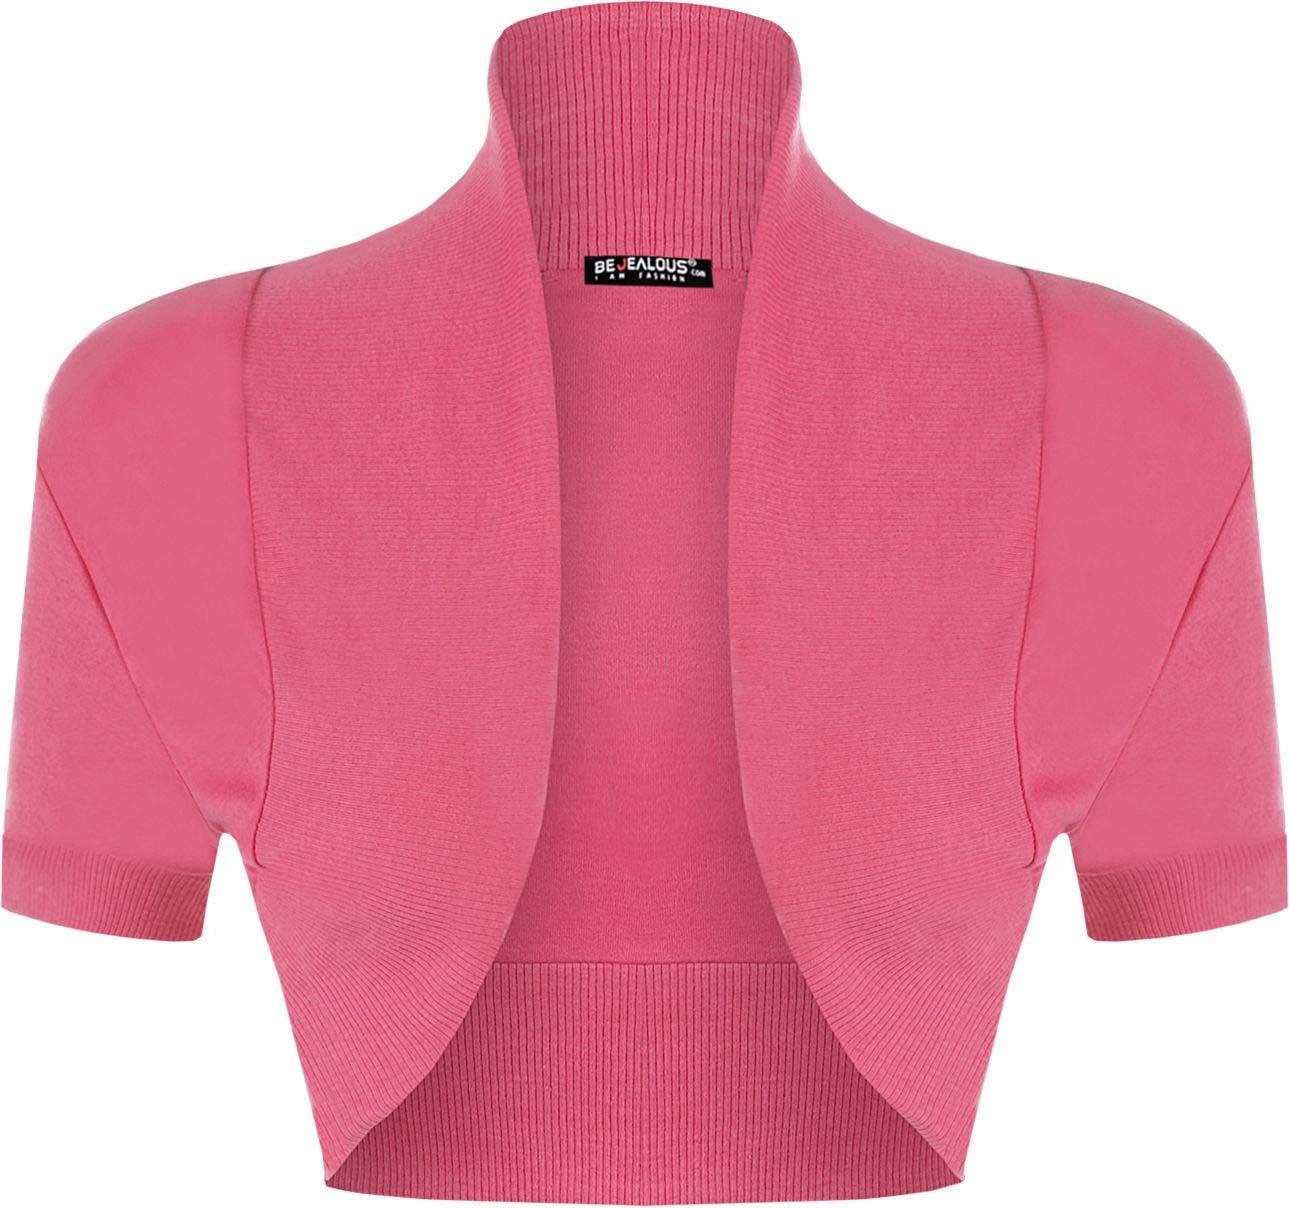 Ladies Womens Cap Sleeves Bolero Open Beaded Sequin Cropped Stretchy Shrug Top